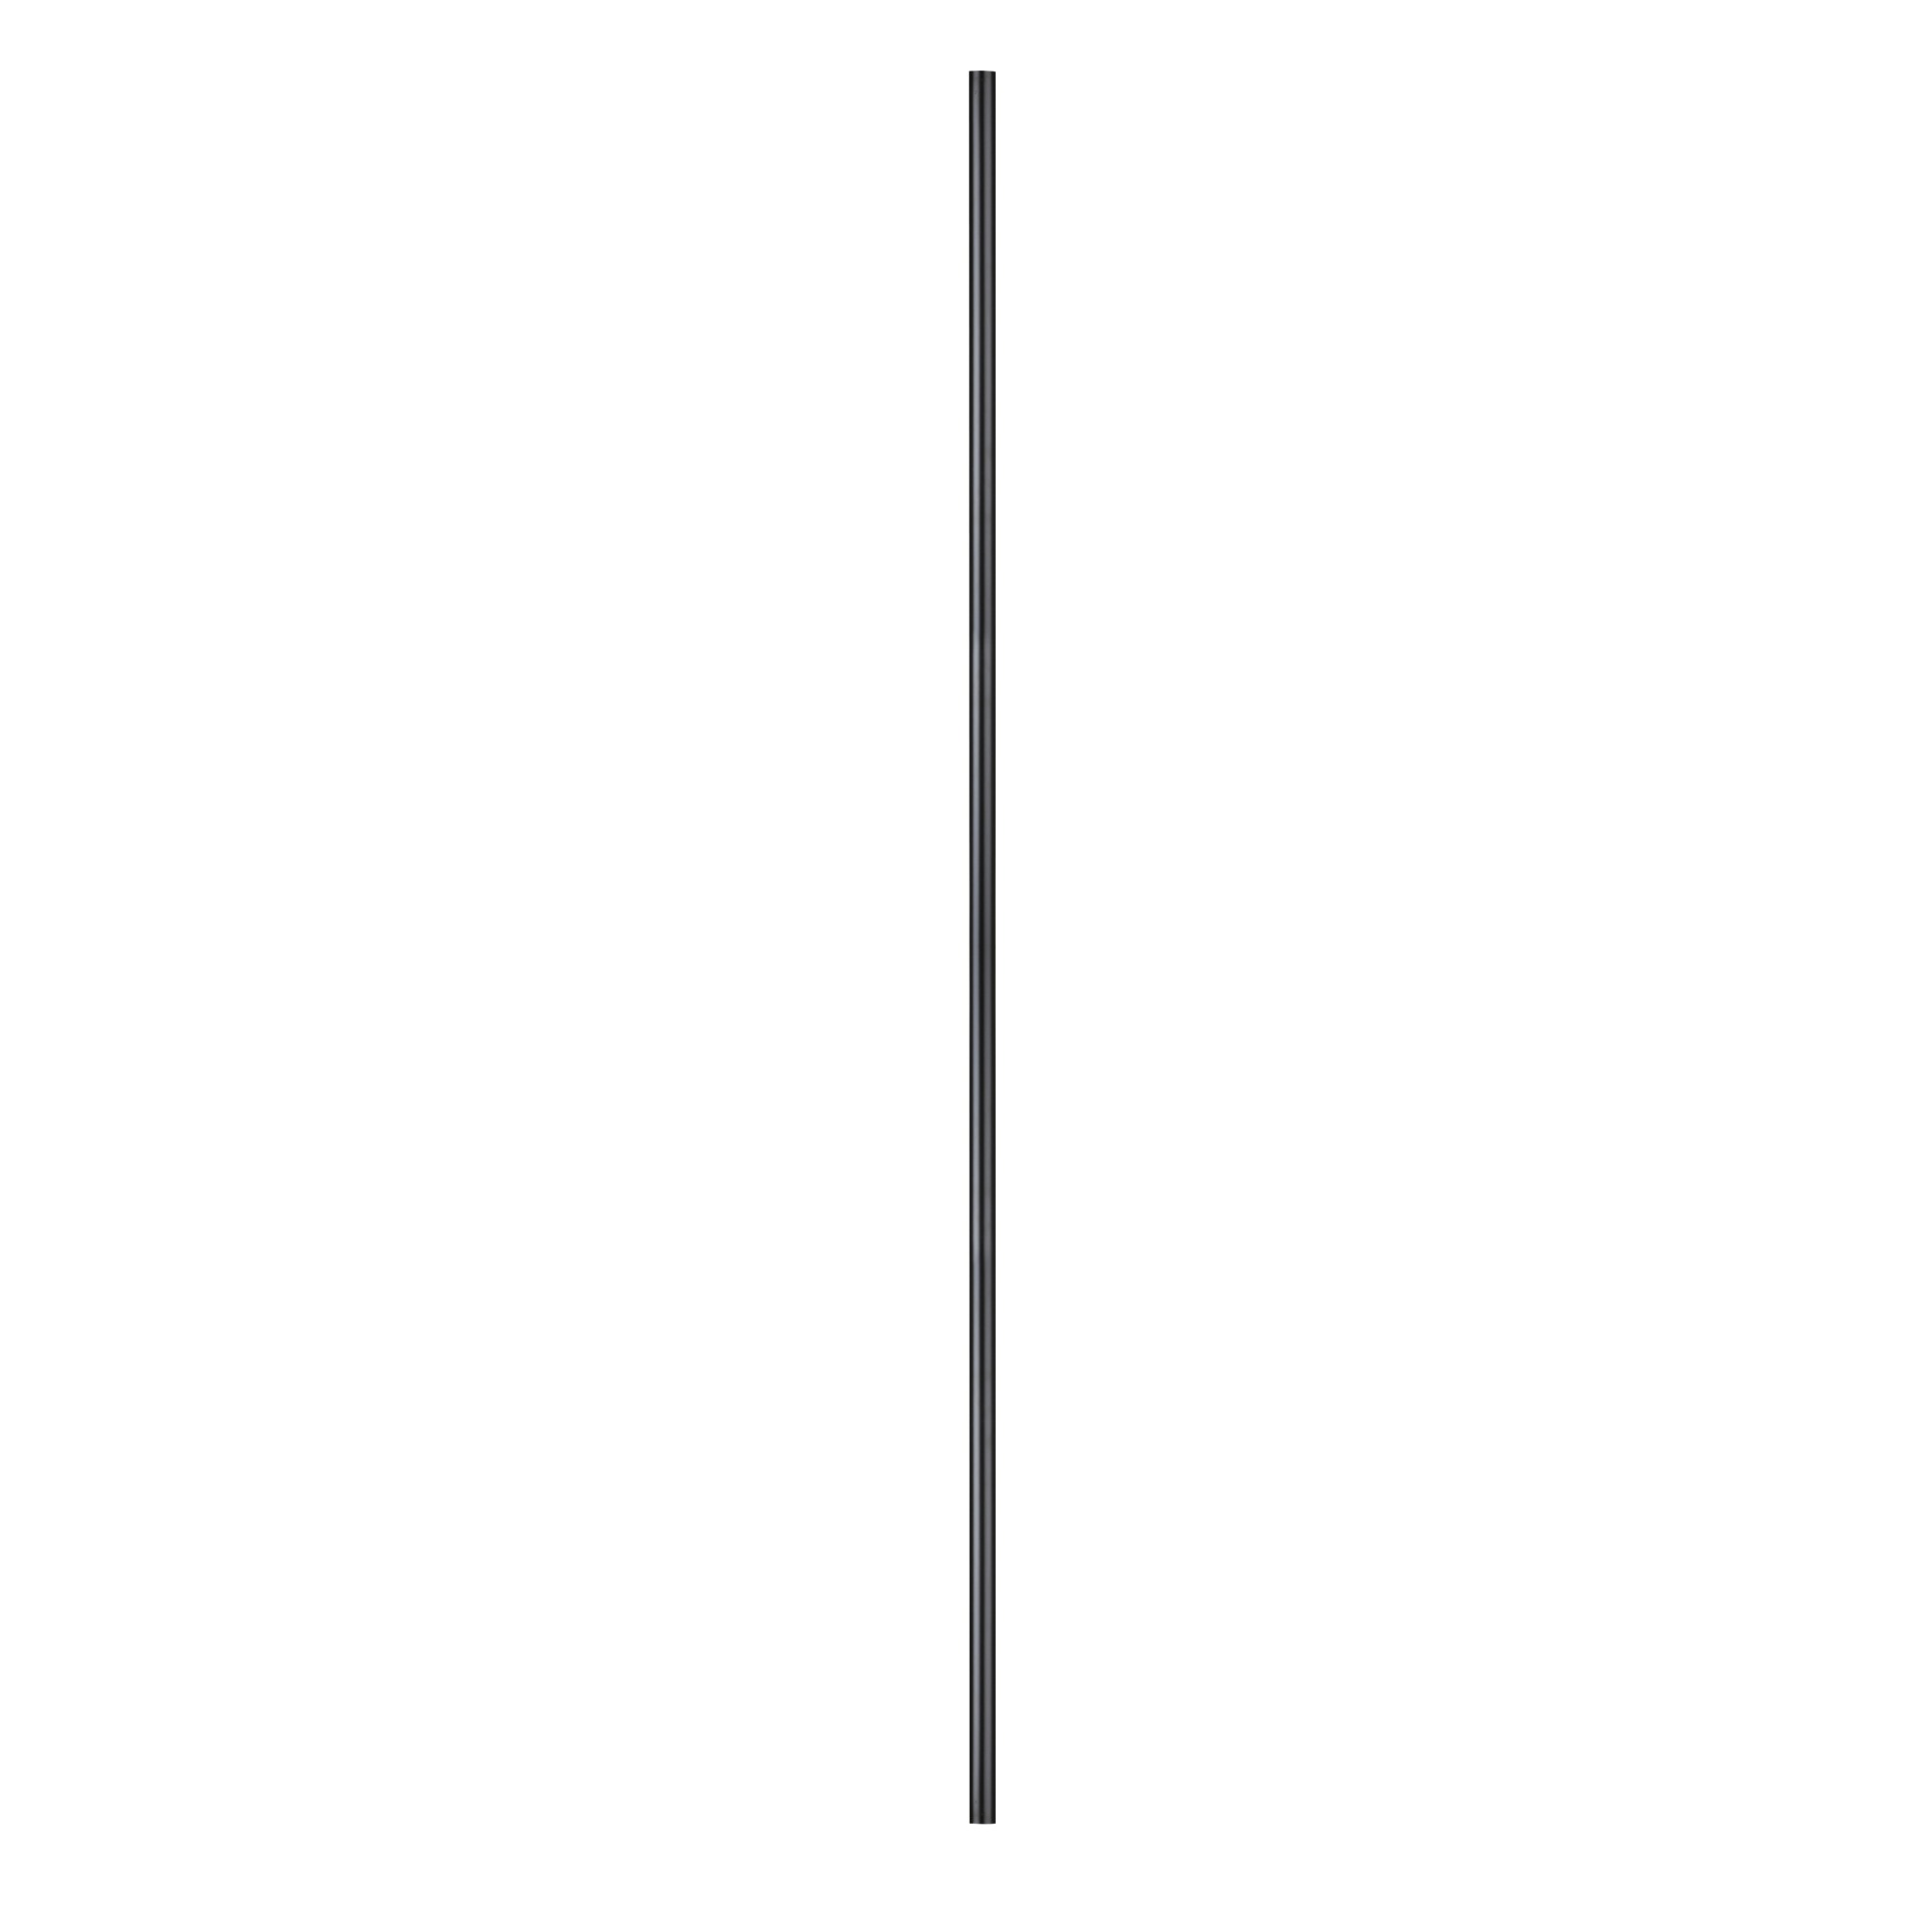 Novidade steigerbuis 2000 x 27 mm zwart